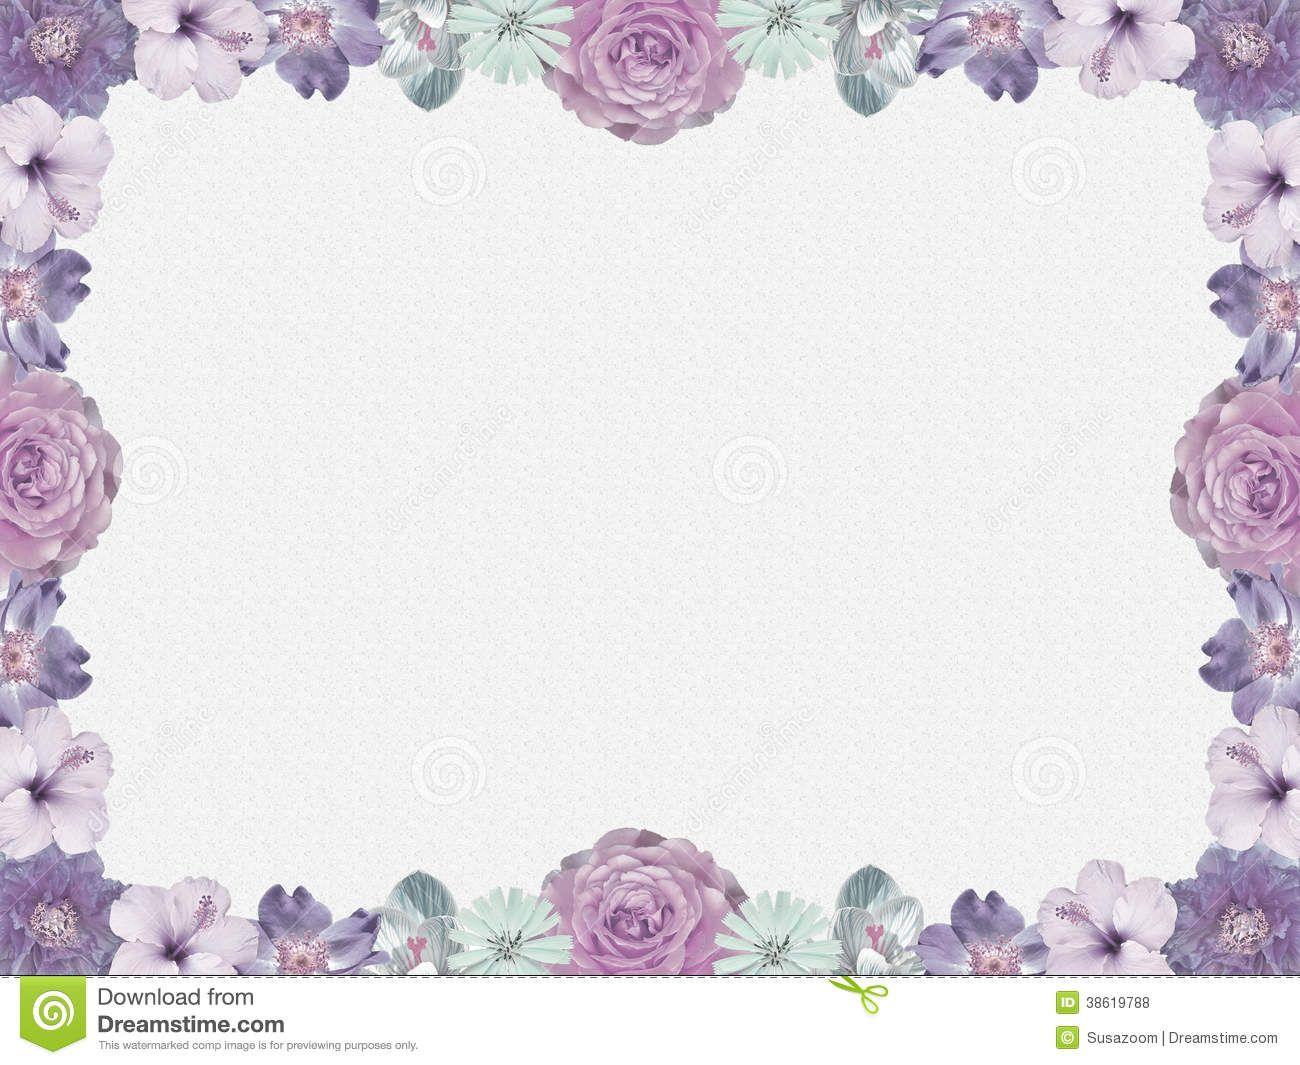 Lavender Background Wedding Wedding Invitation Border Wedding Invitations Borders Flower Frame Floral Border